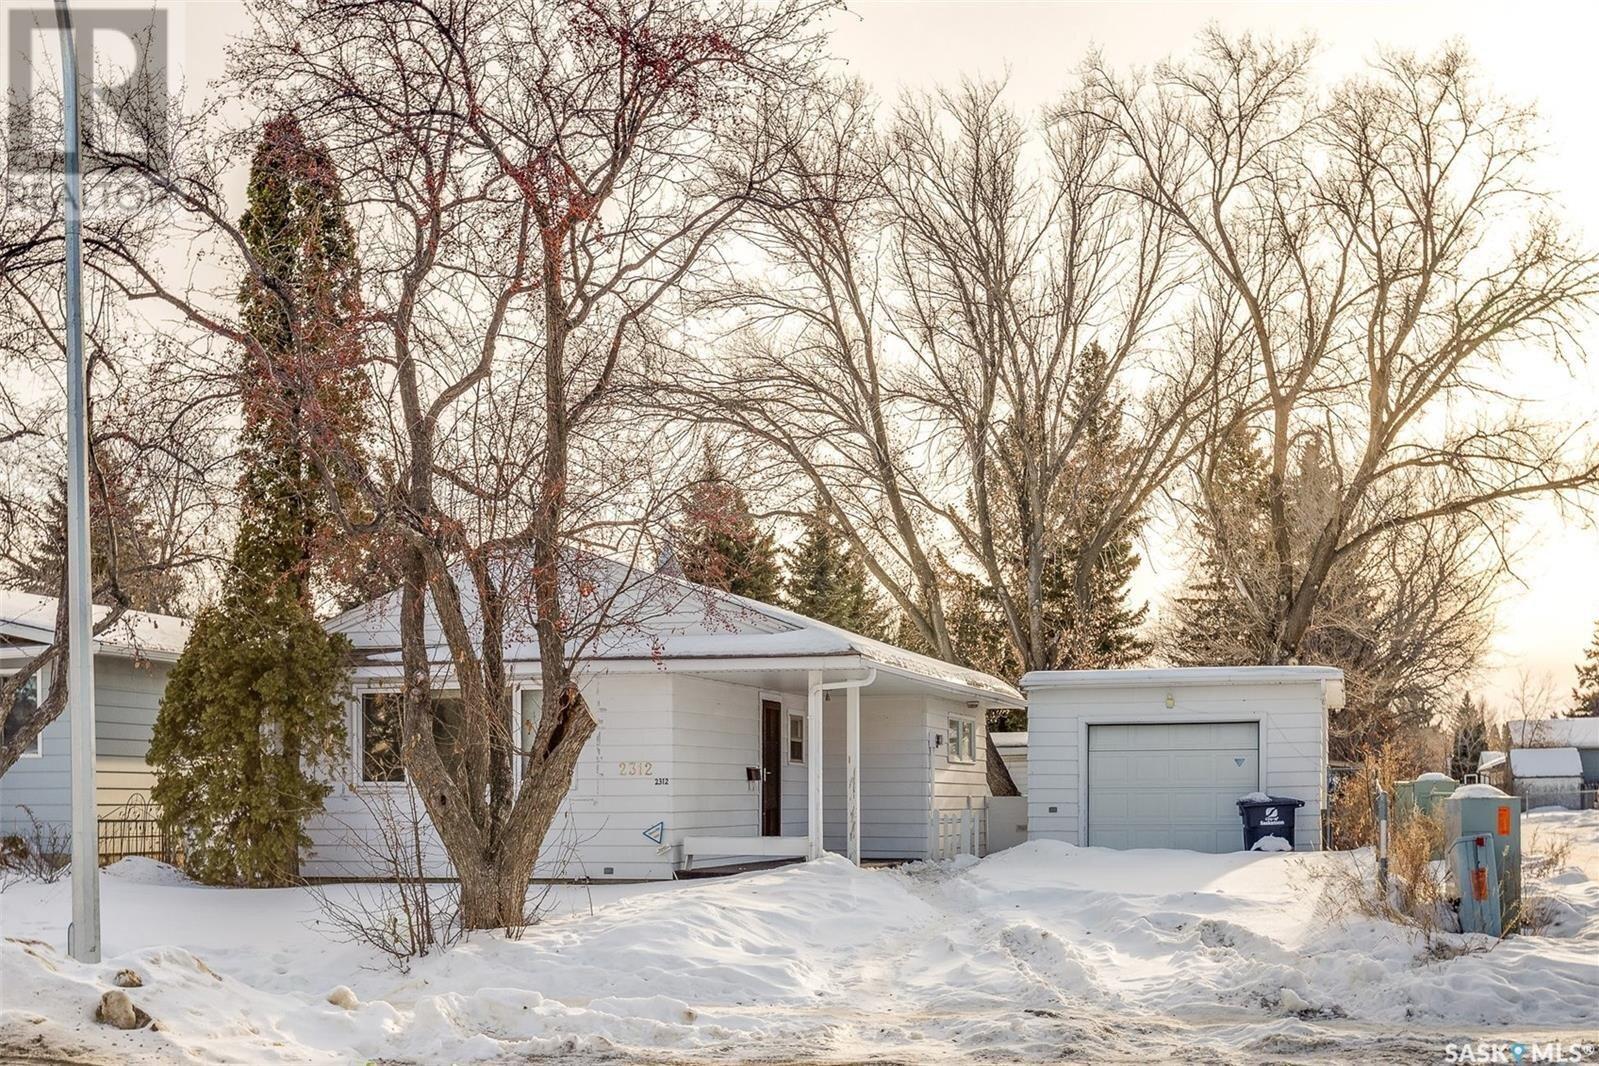 House for sale at 2312 7th St E Saskatoon Saskatchewan - MLS: SK839428